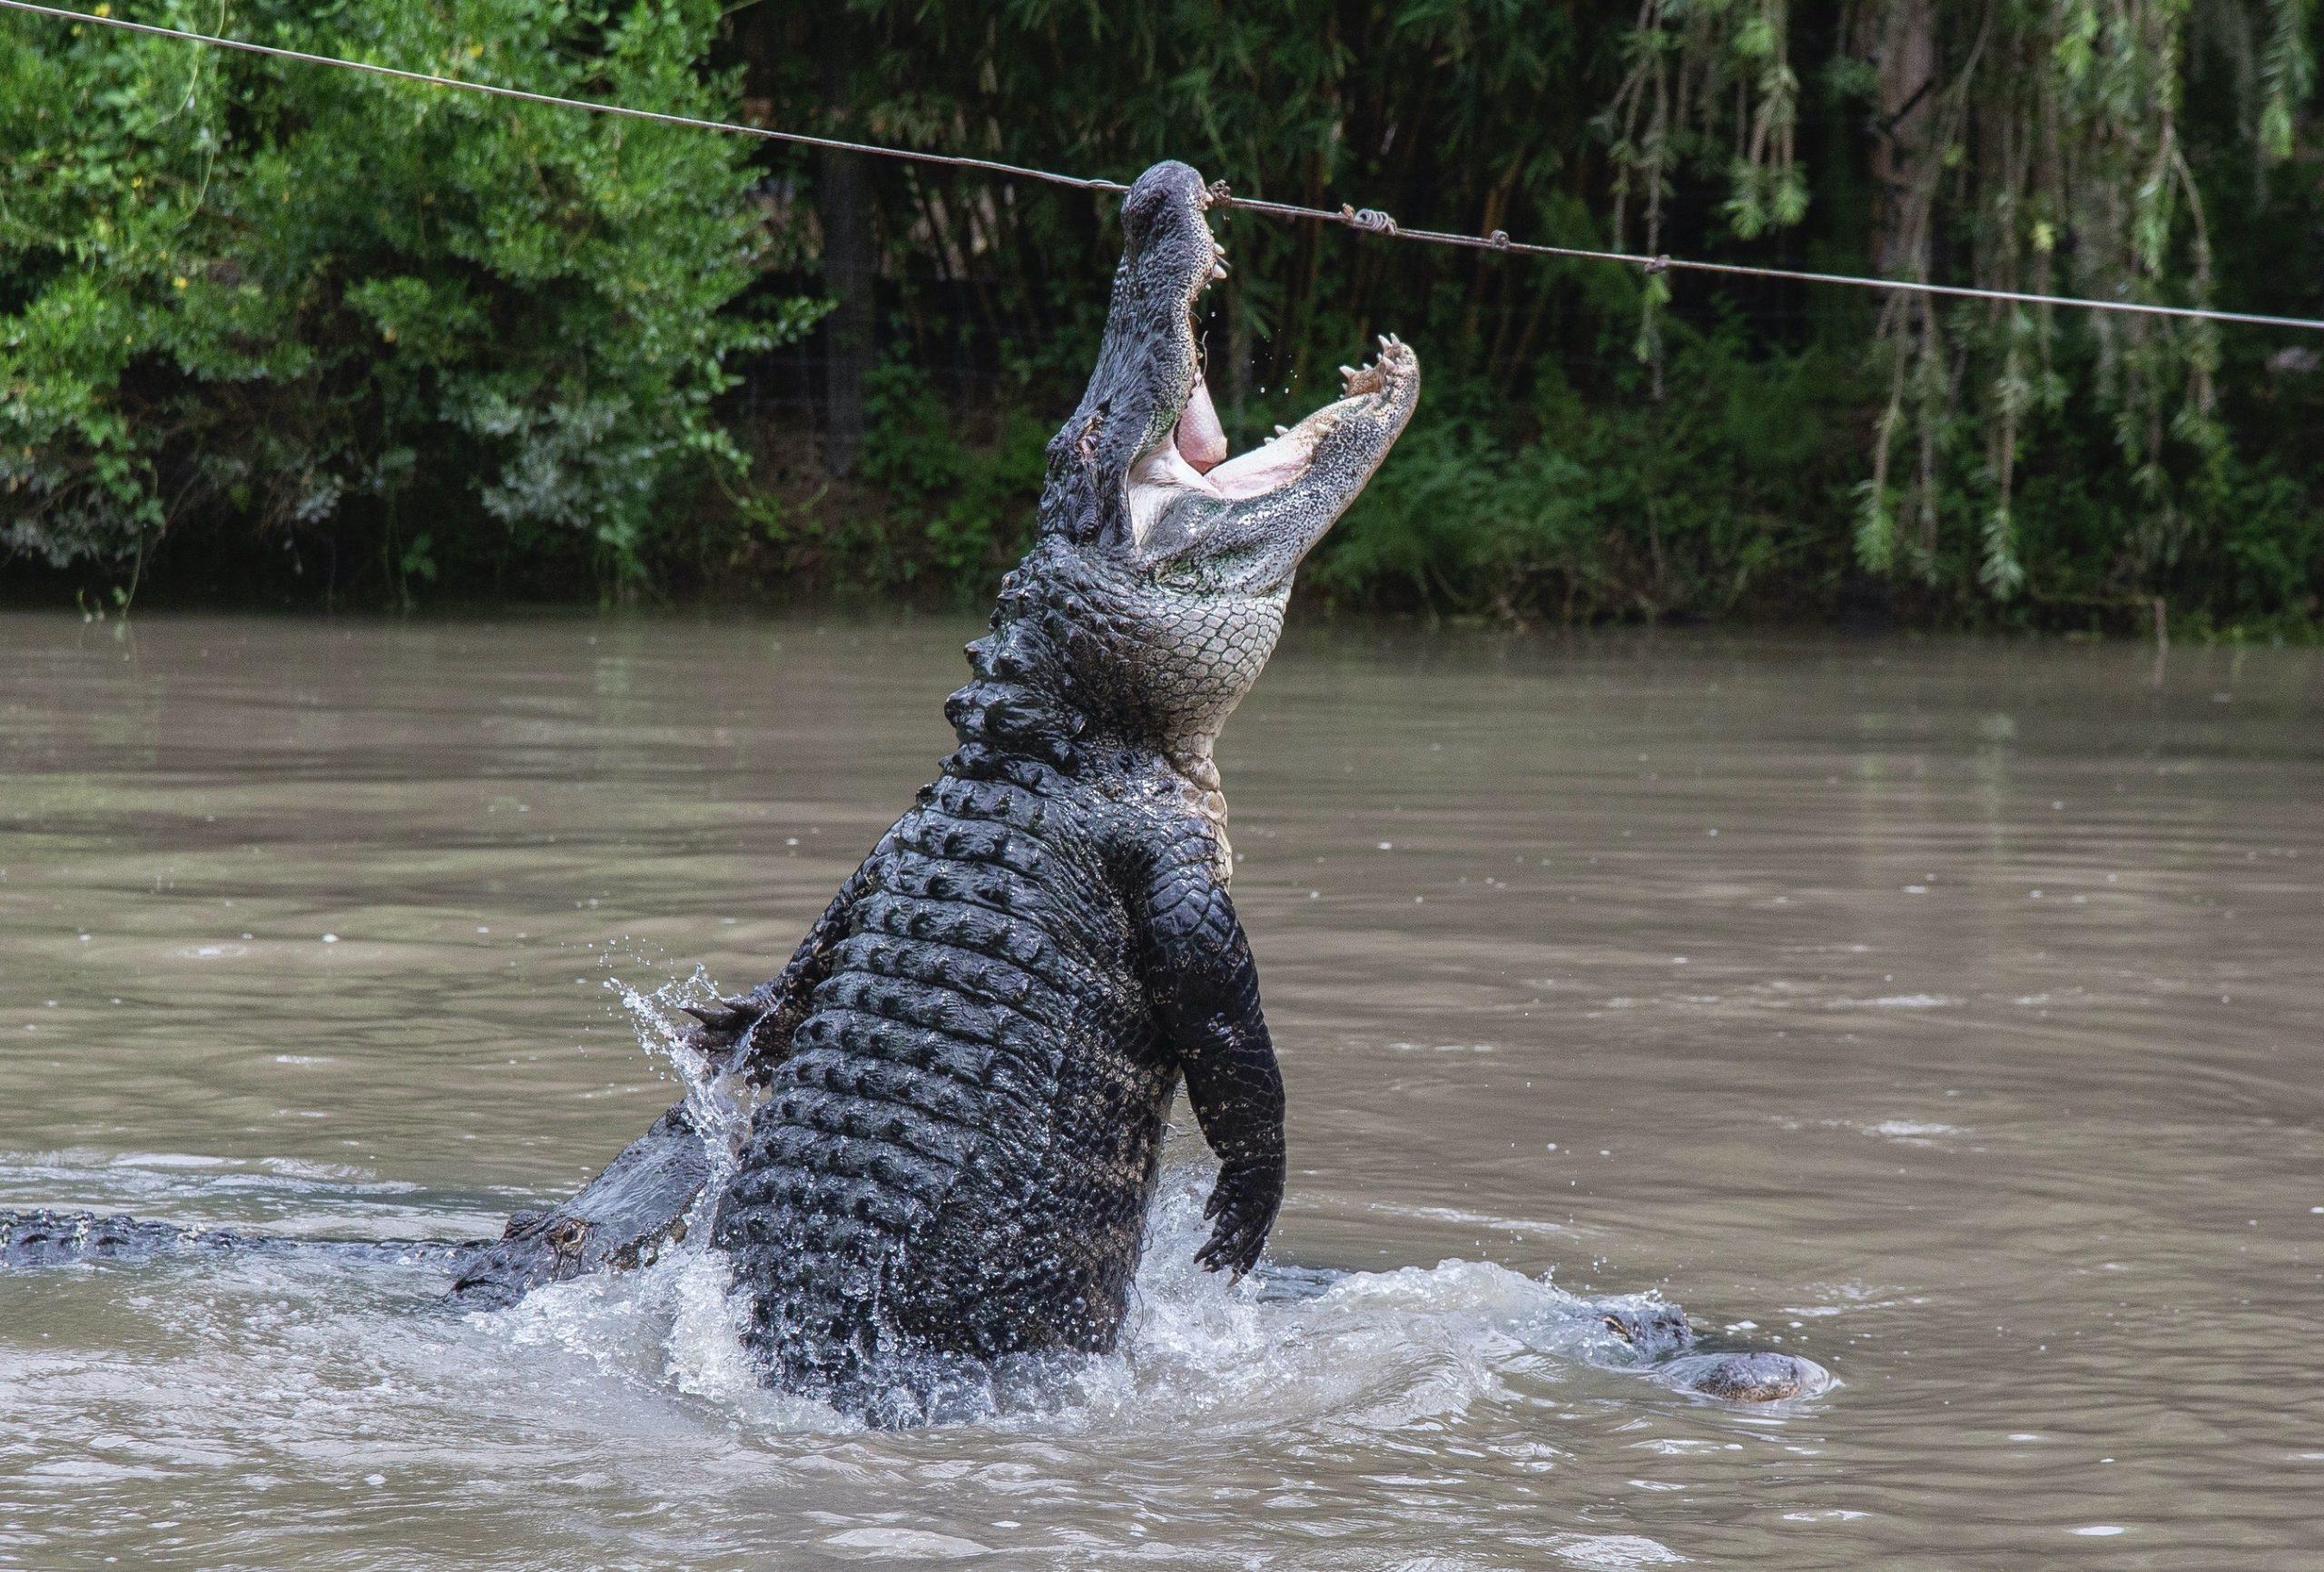 Gator Jumpathon!